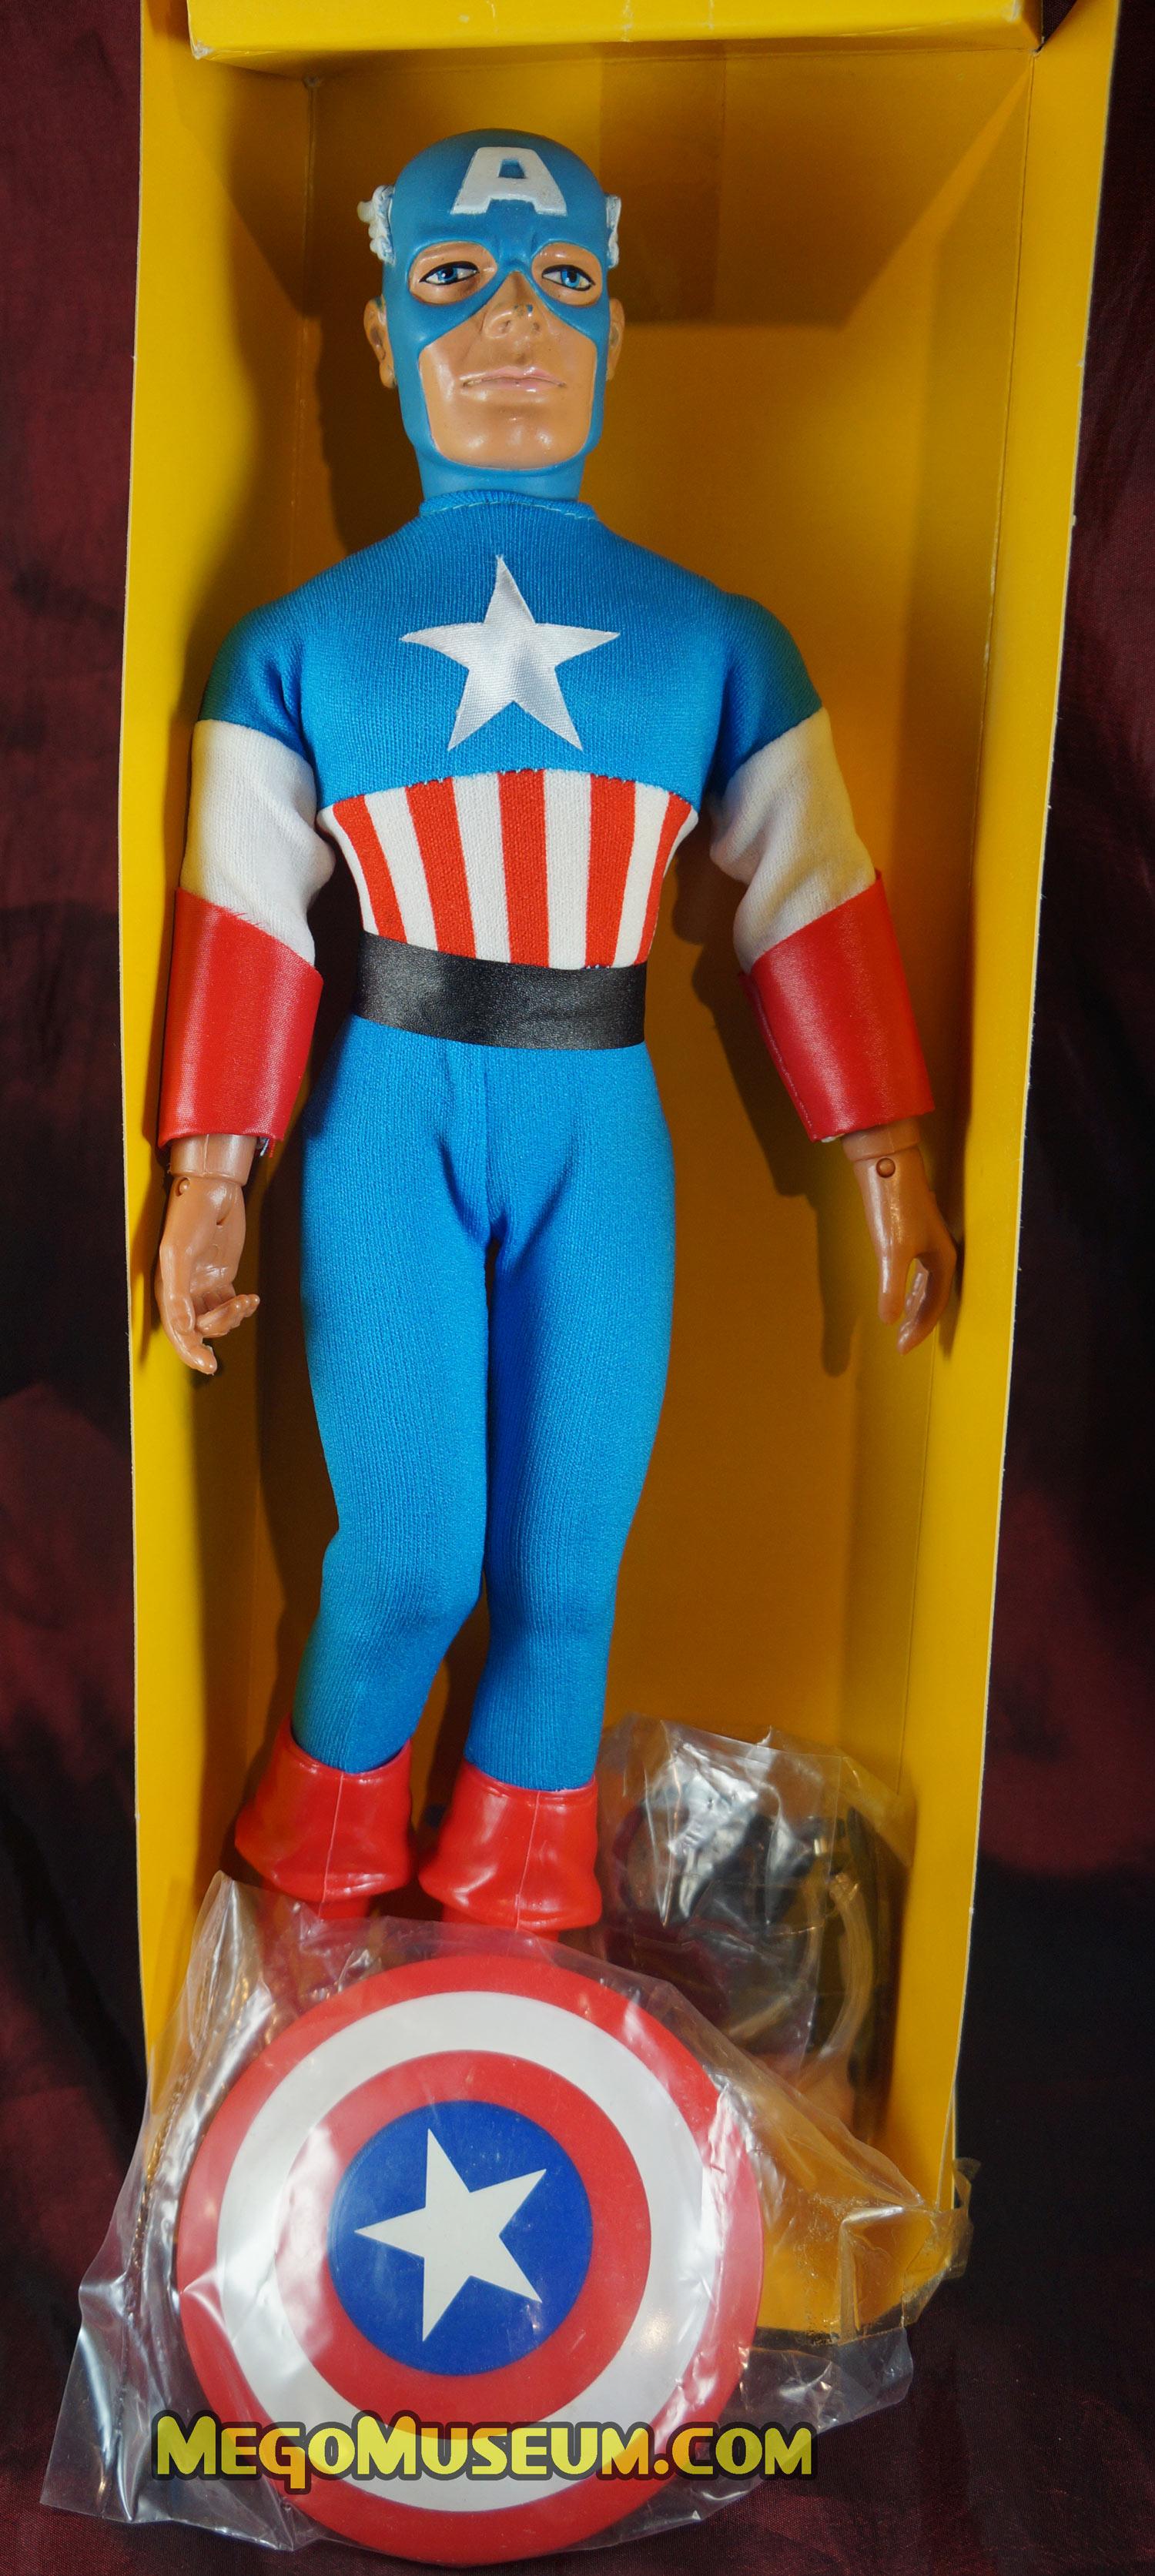 MegoMuseum 12 Inch Mego Captain America